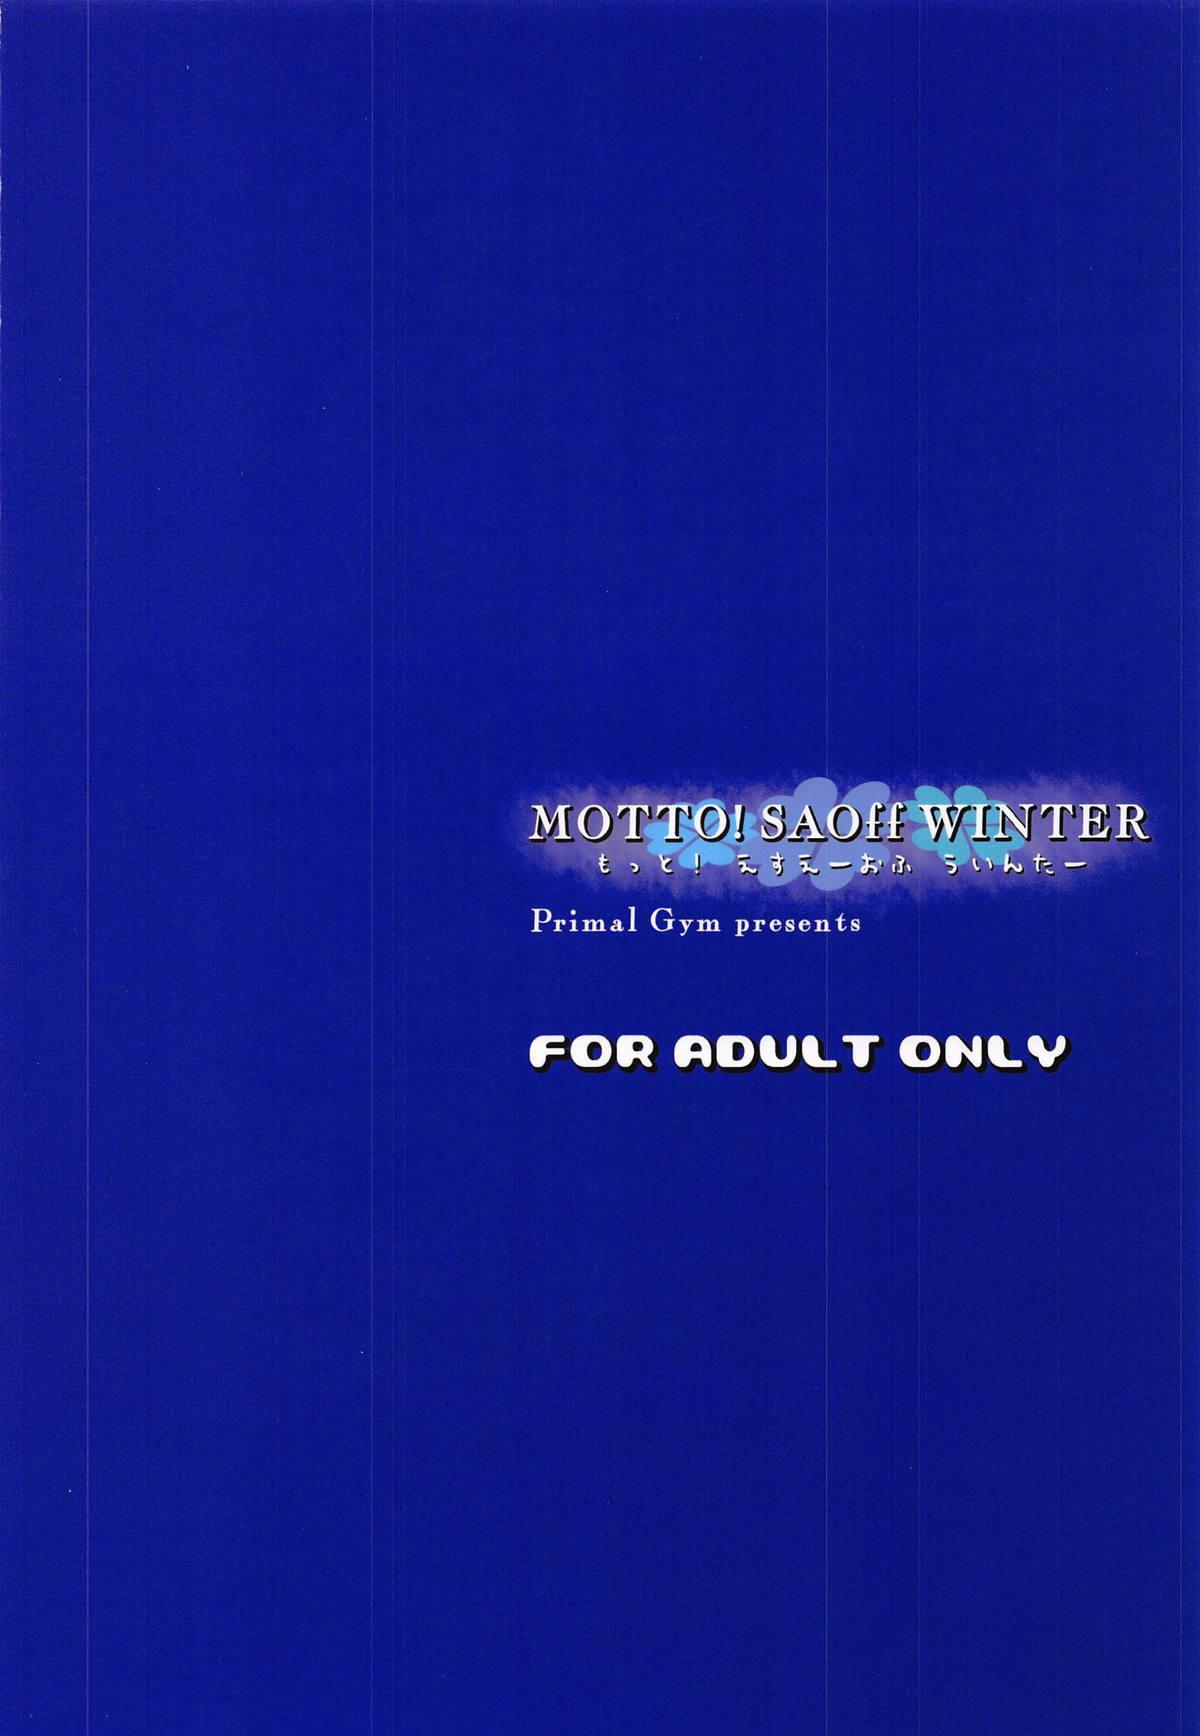 MOTTO! SAOff WINTER 25